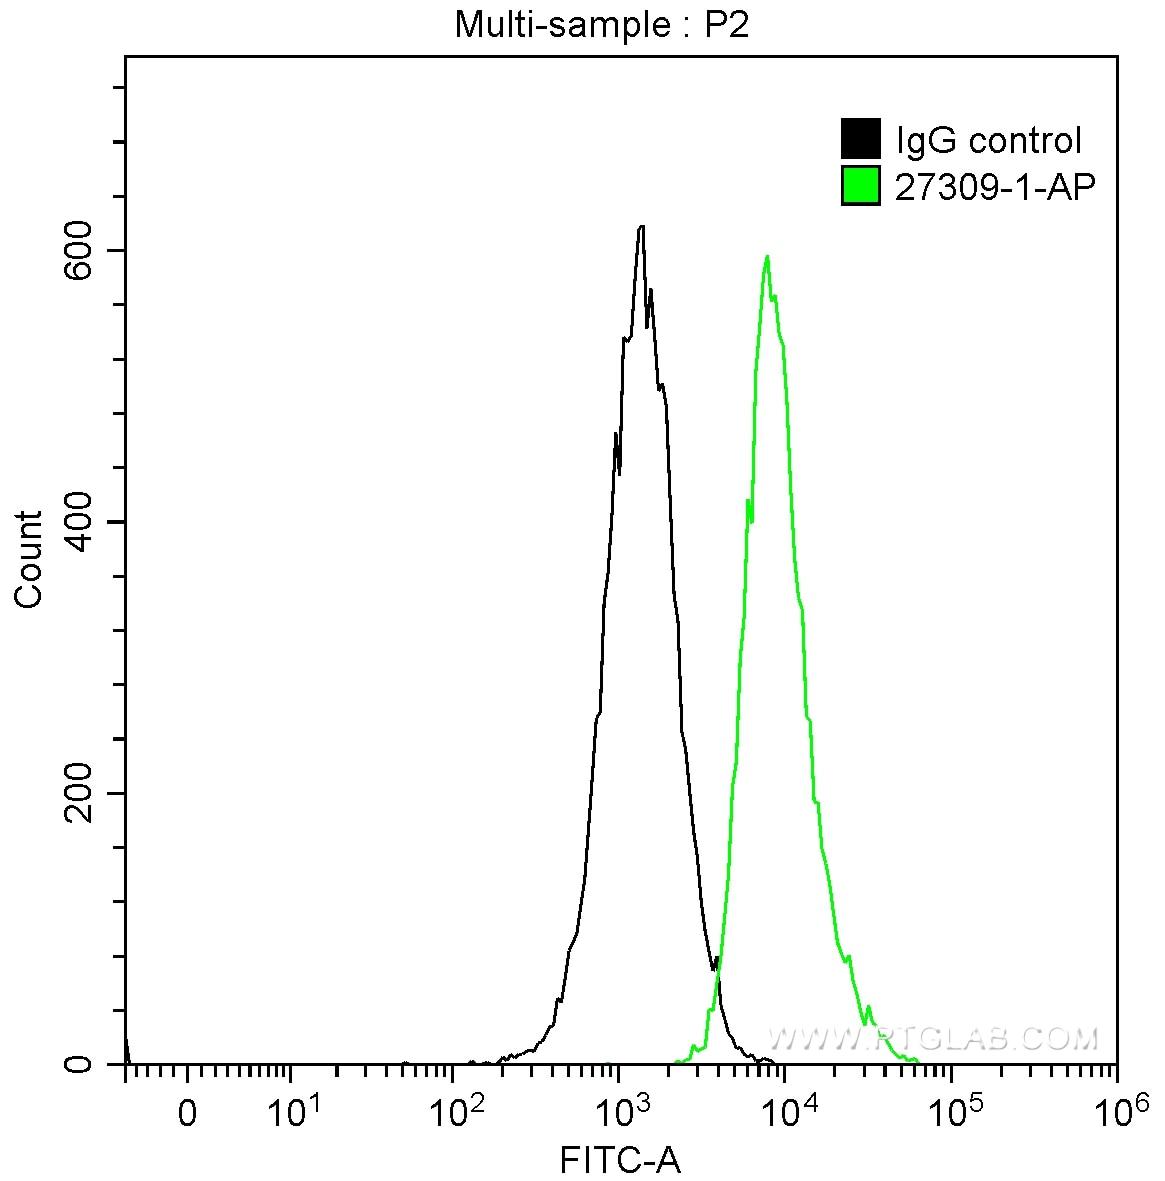 FC experiment of Jurkat using 27309-1-AP